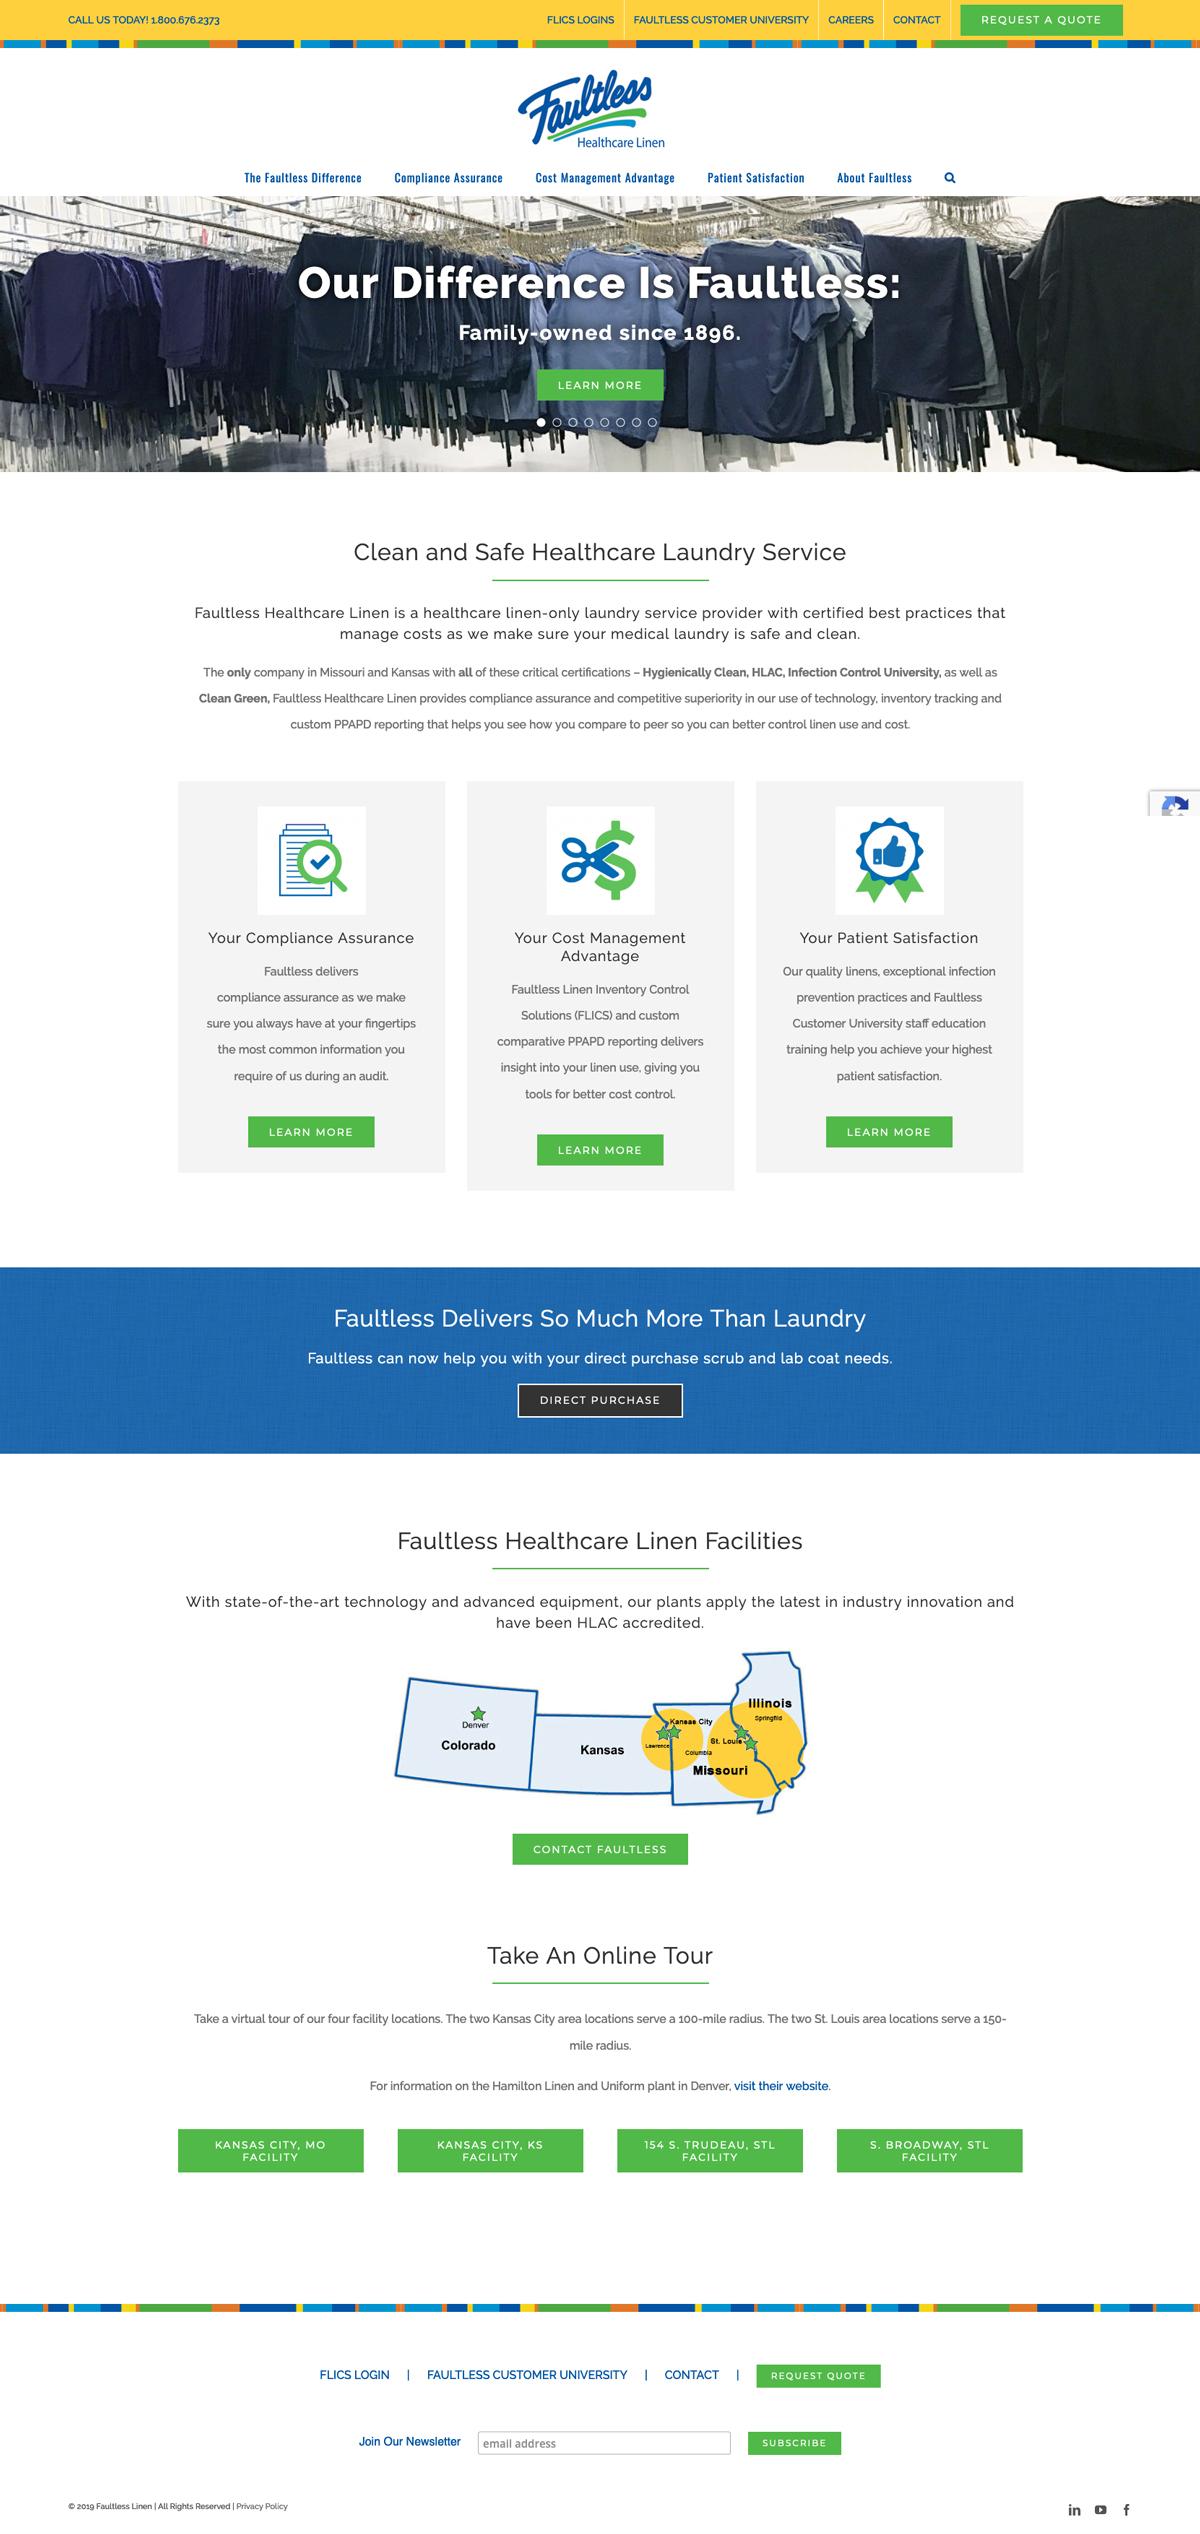 Company Website Design for Faultless Healthcare Linen